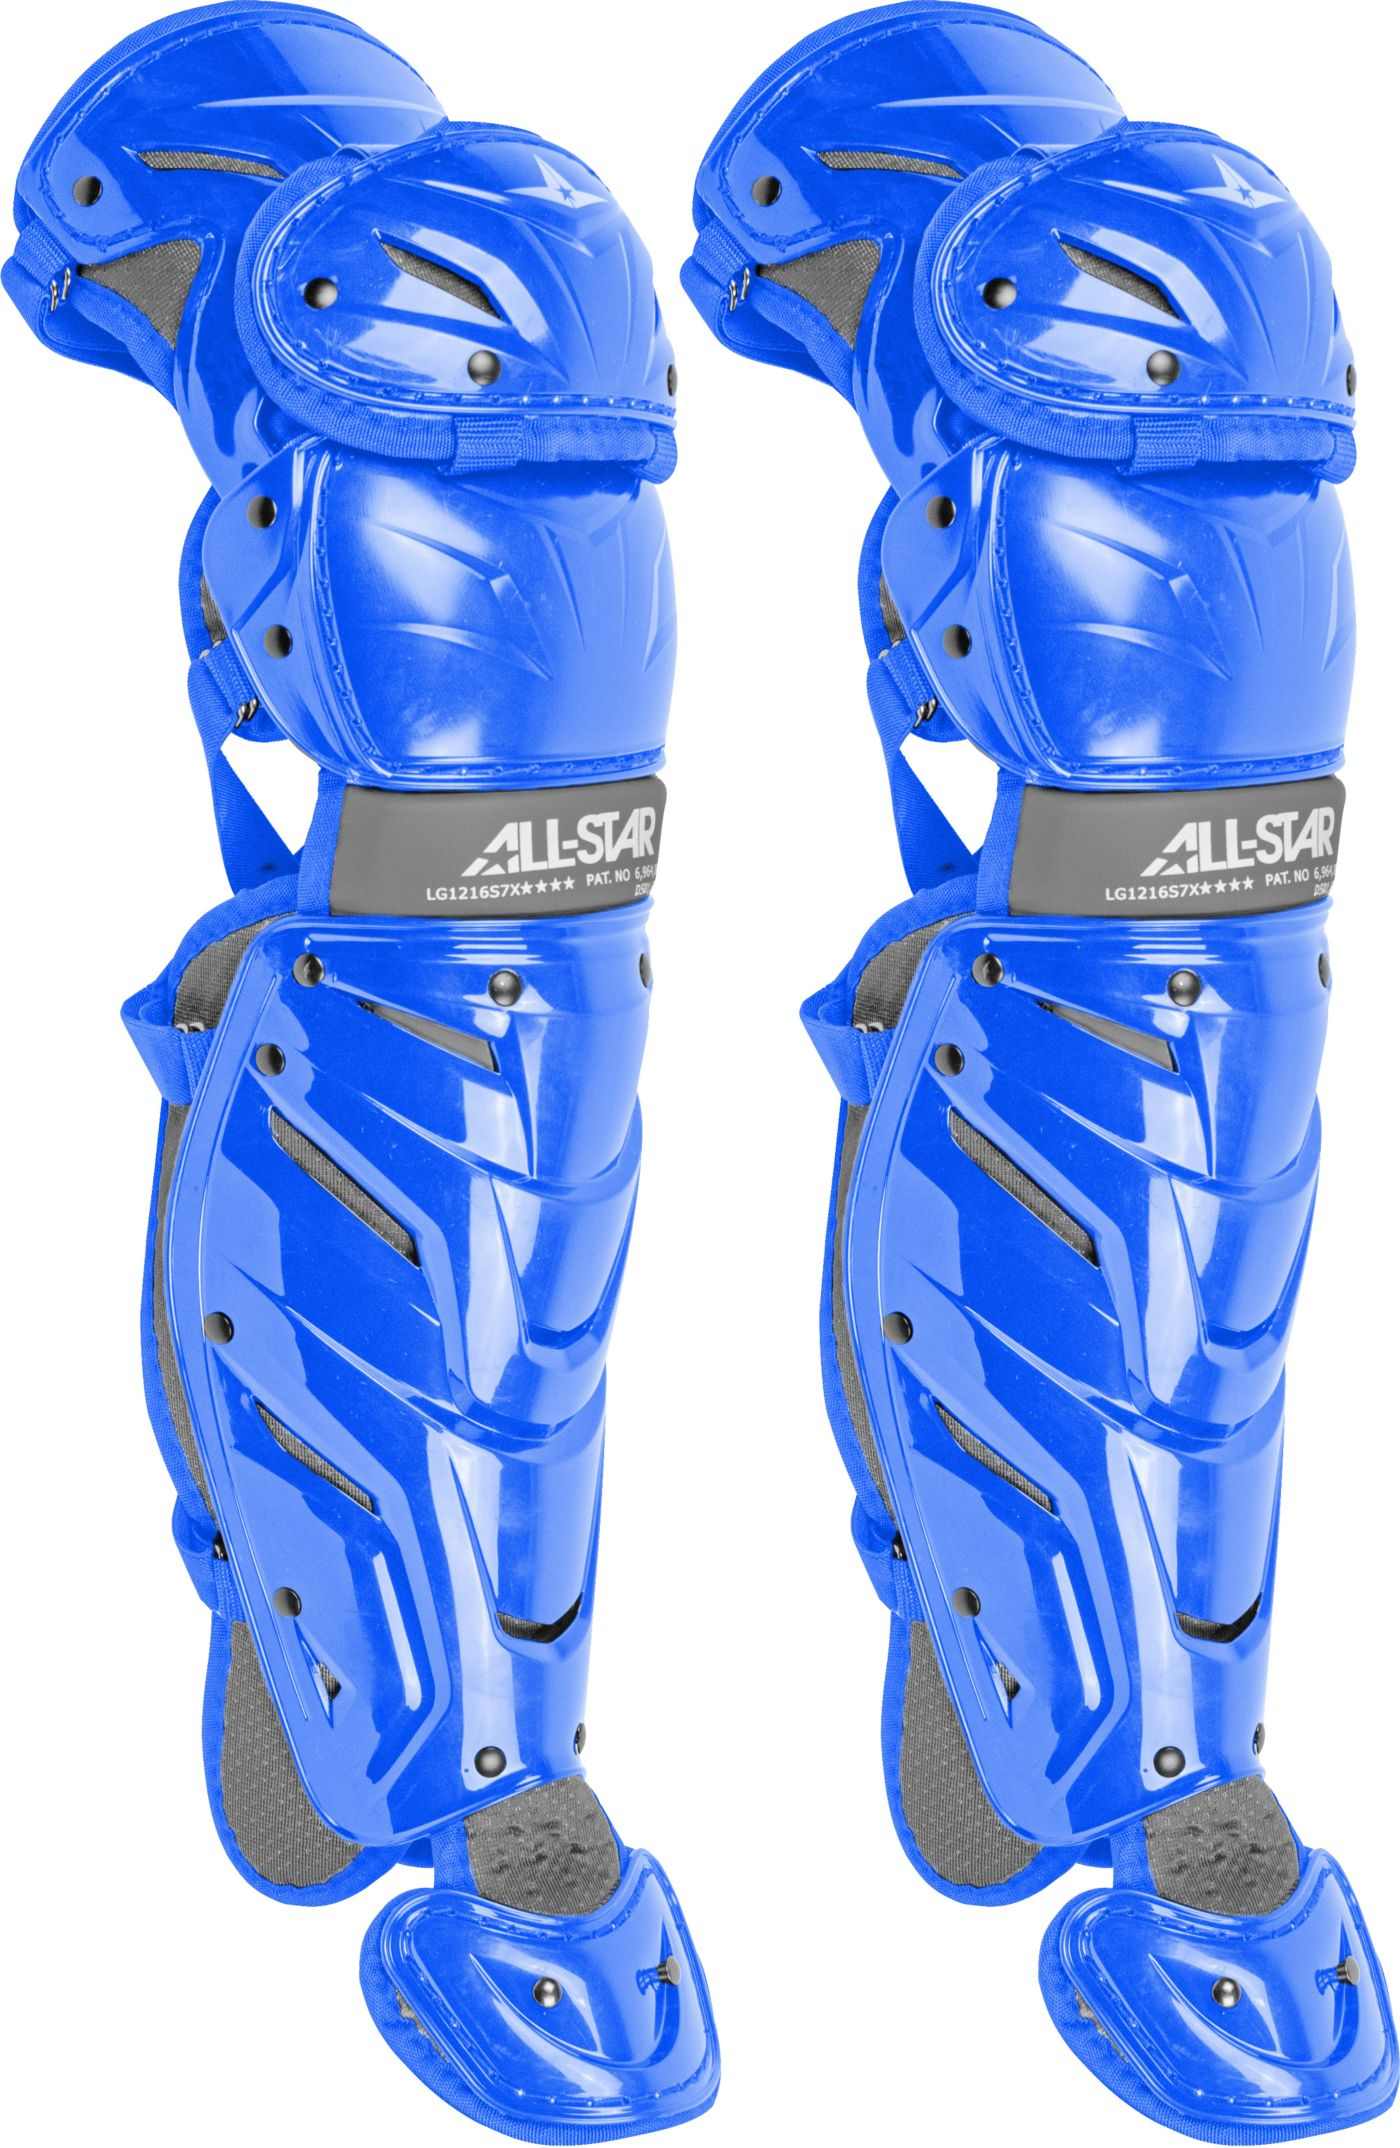 All-Star Intermediate 14.5'' S7 AXIS Leg Guards